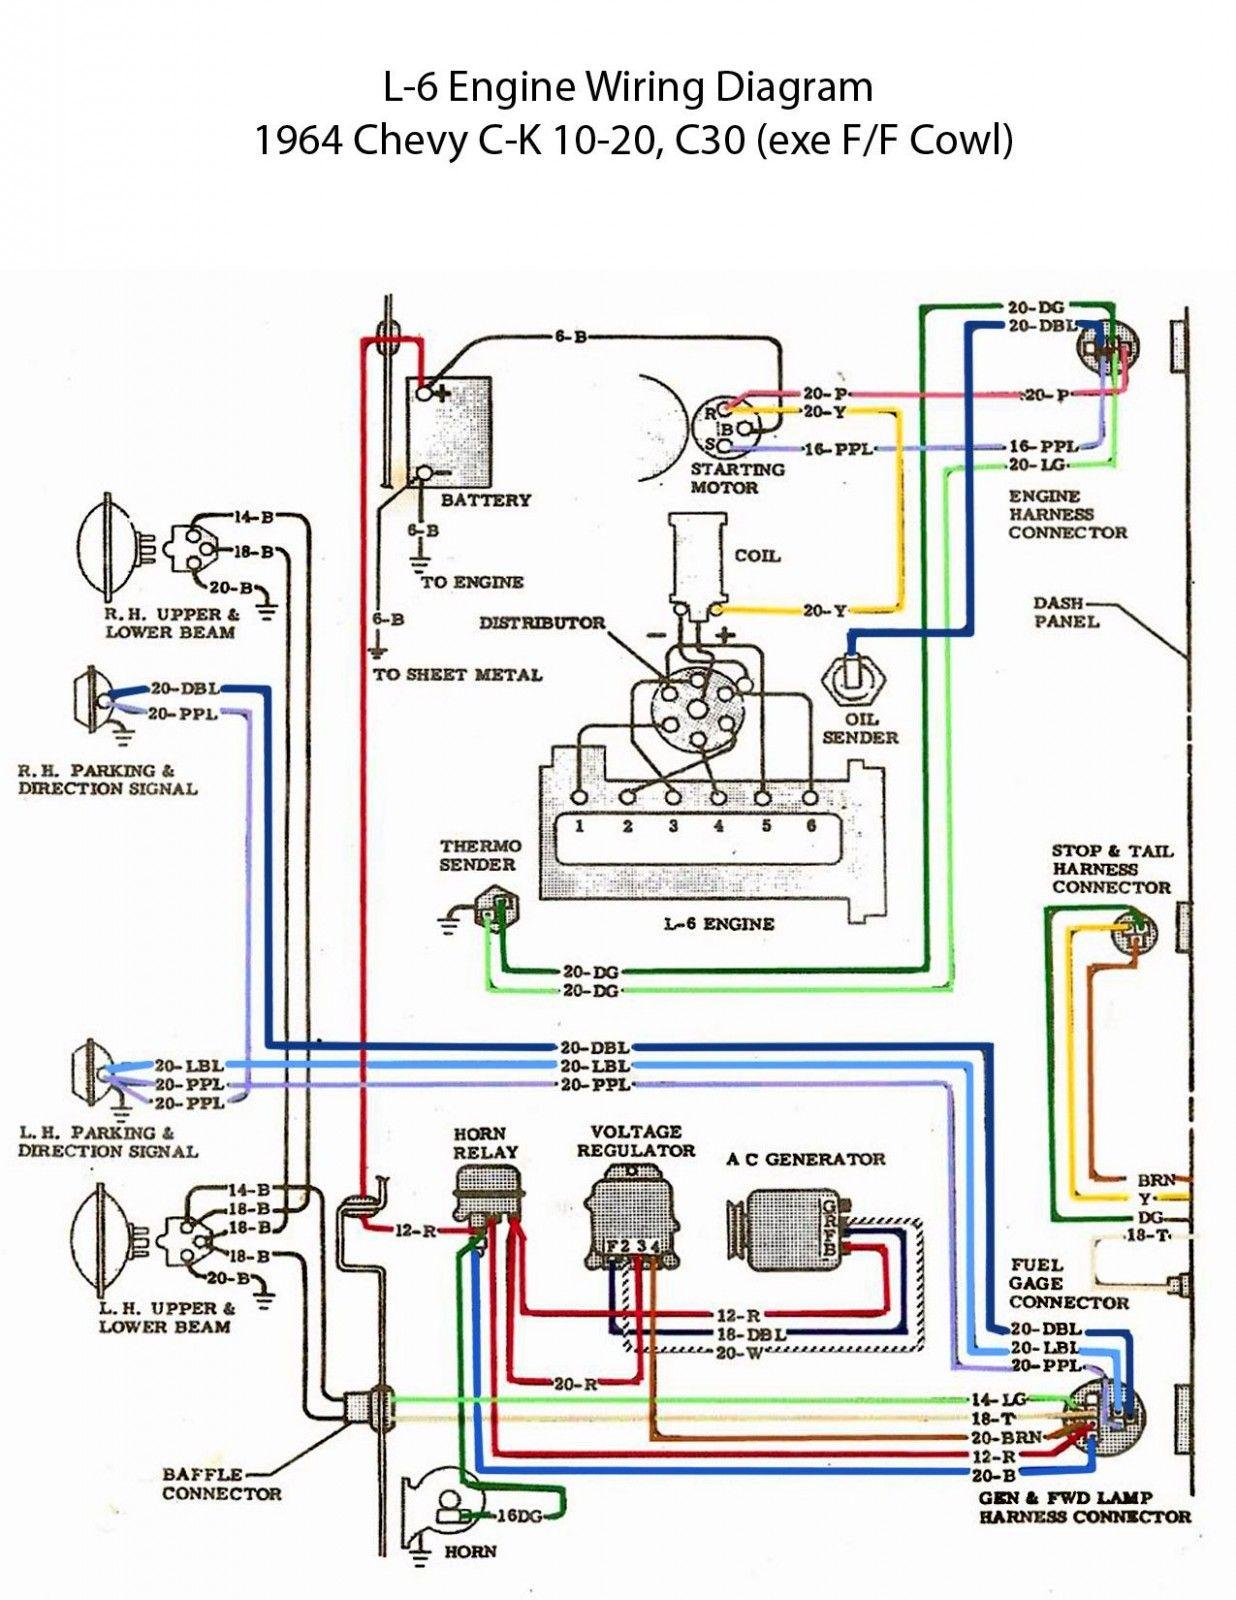 Engine Diagram Simple Zero Teknik Mesin Teknologi Diagram